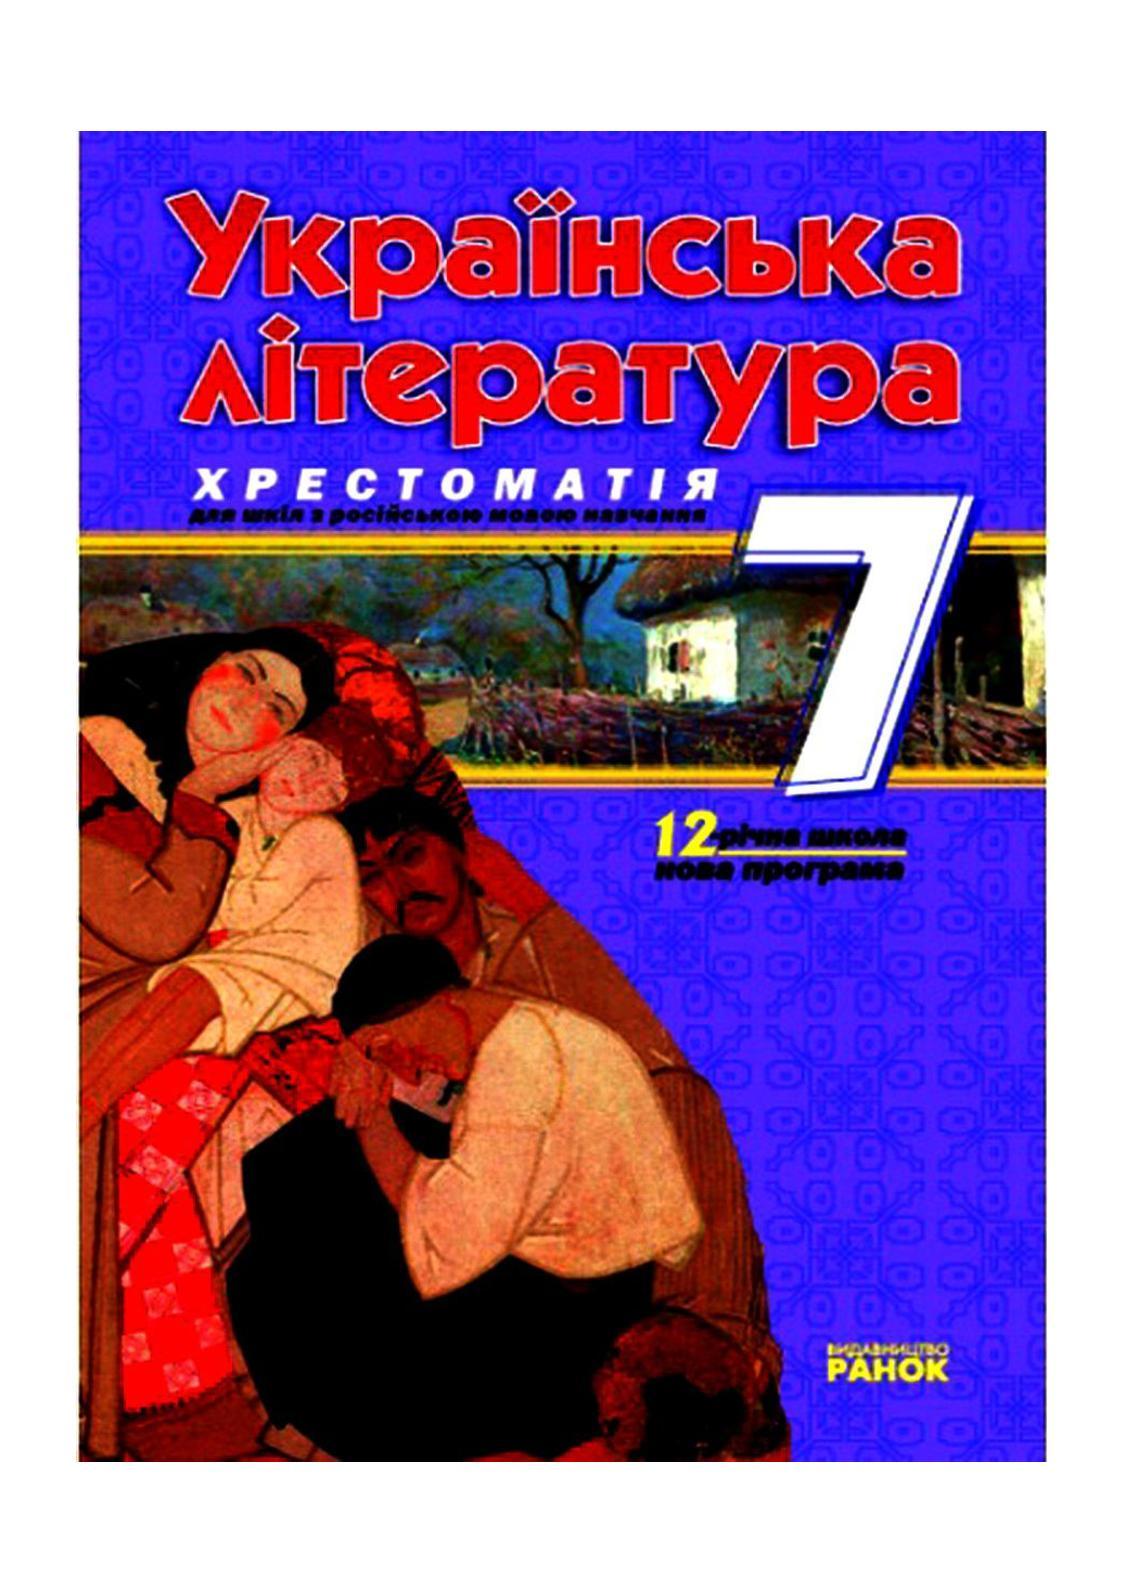 7 клас. Українська література. Хрестоматія (Паращич) - 2010